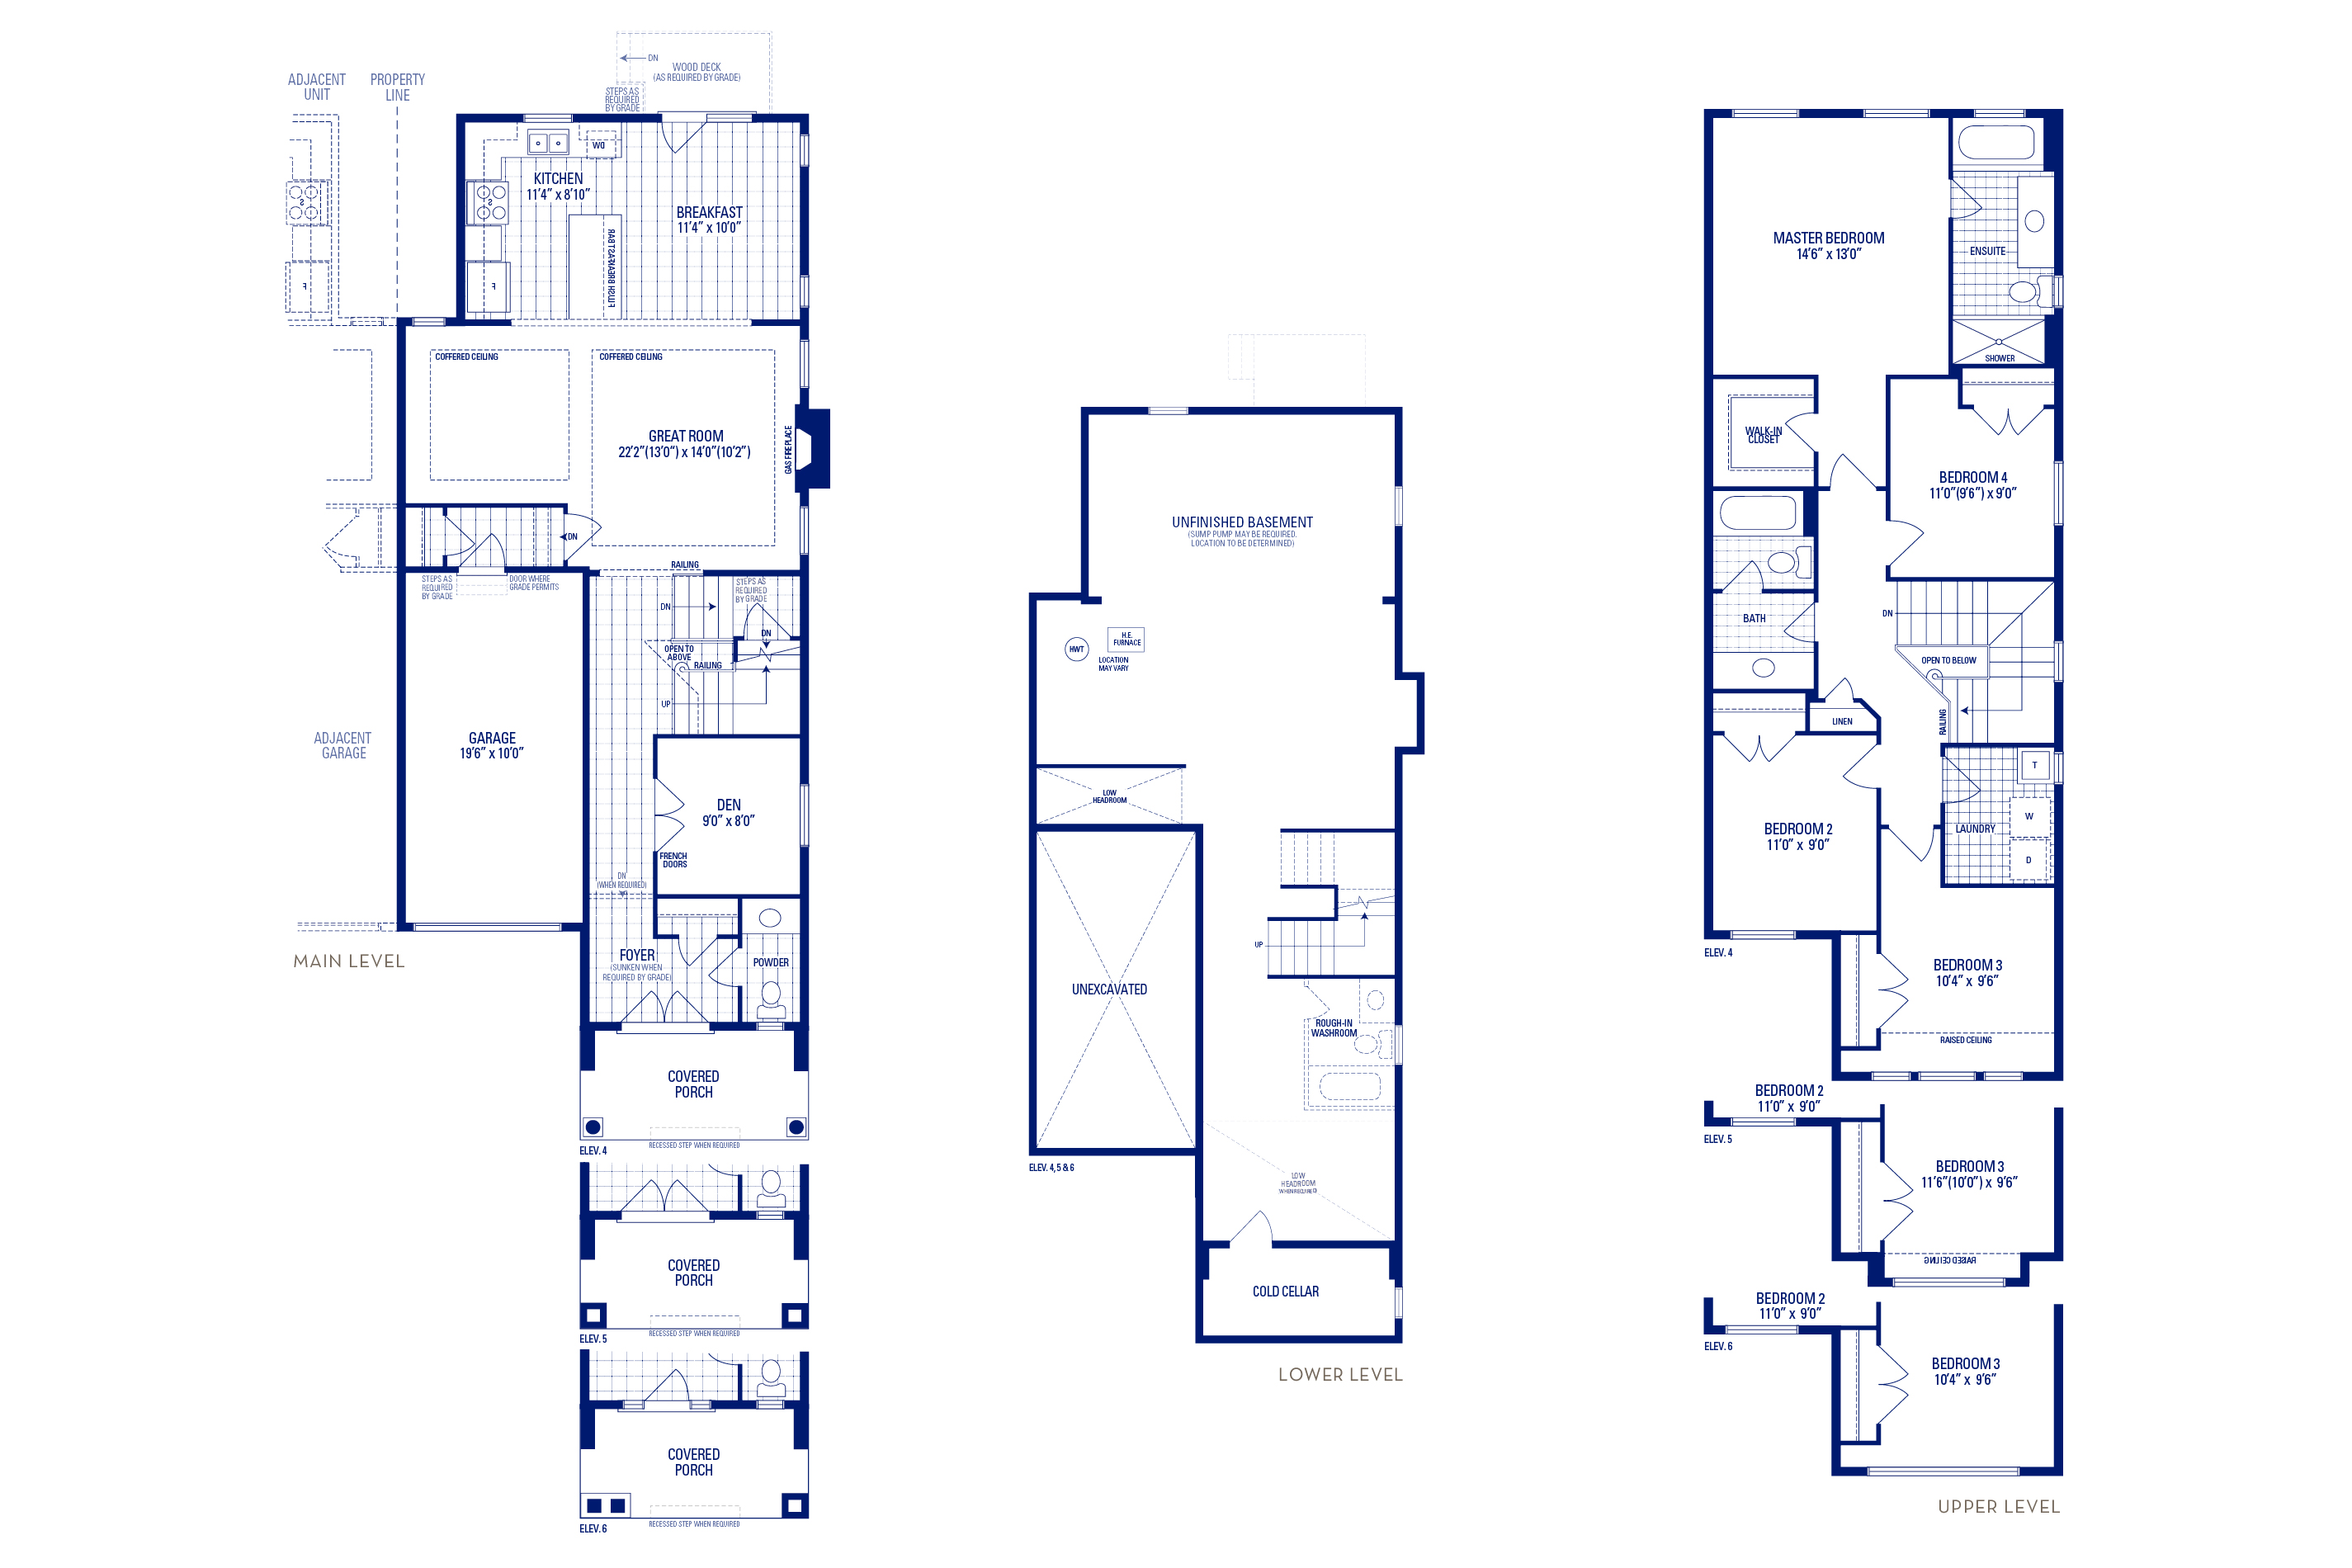 Newberry 02 Elev. 6 Floorplan